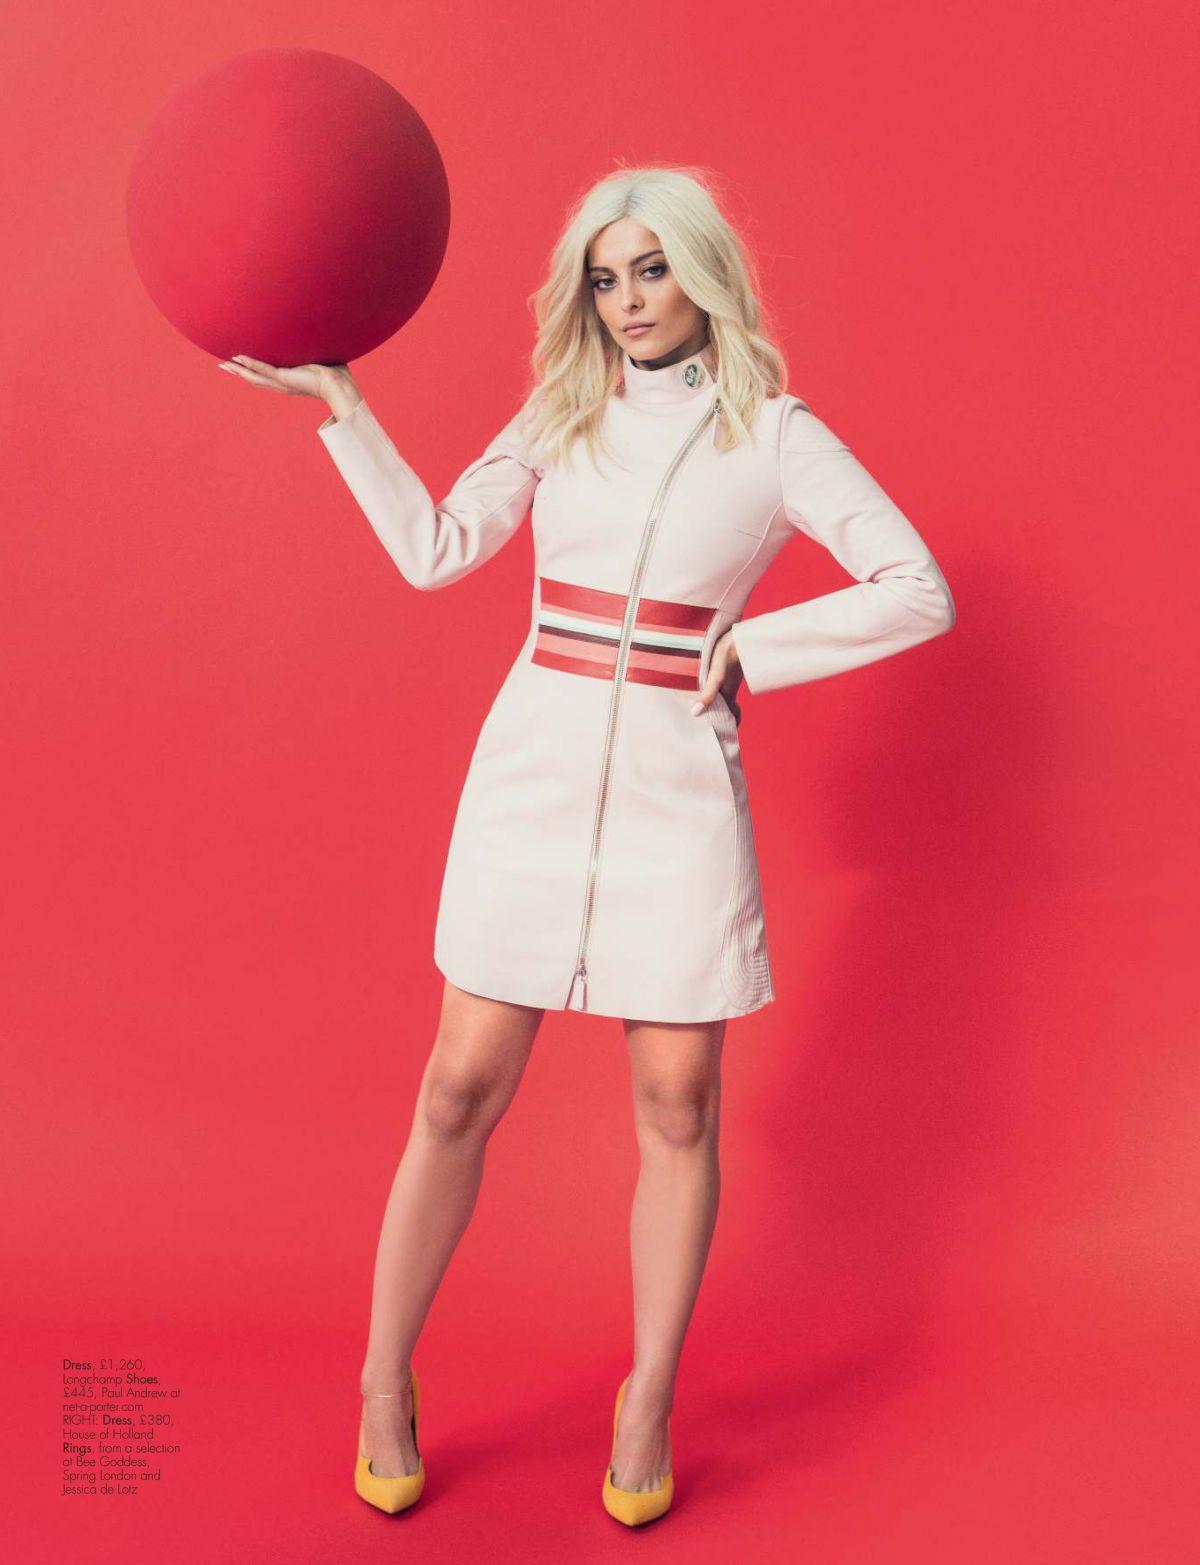 Bebe Rexha in Hello Fashion Magazine - May 2017